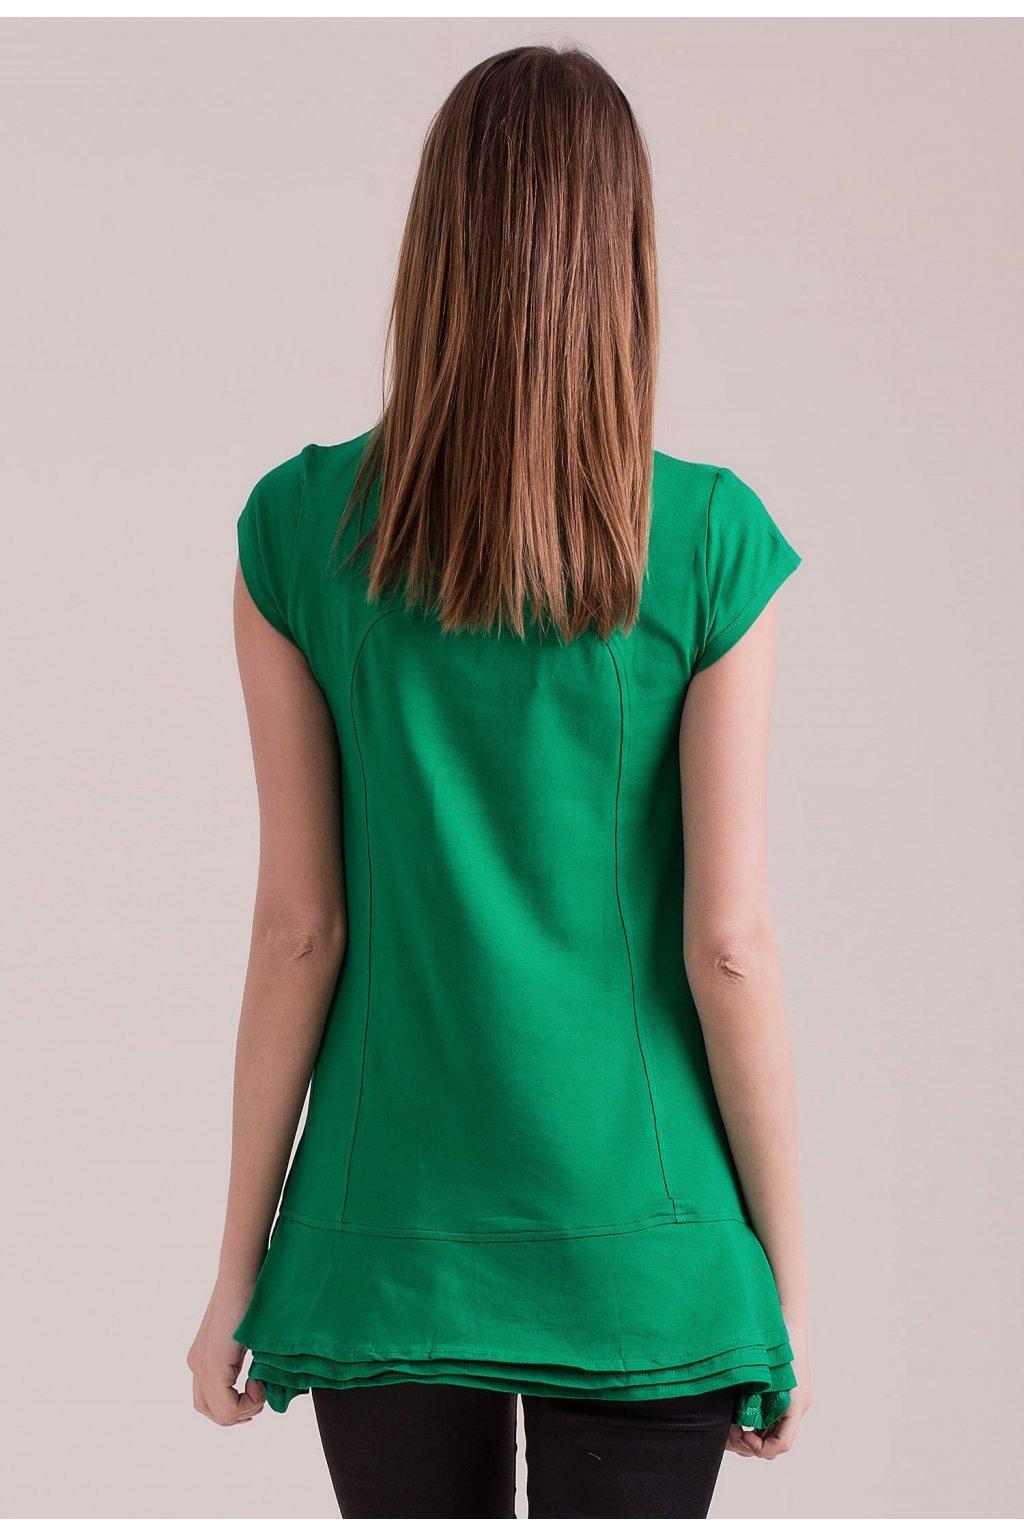 Zelená dámska tunika